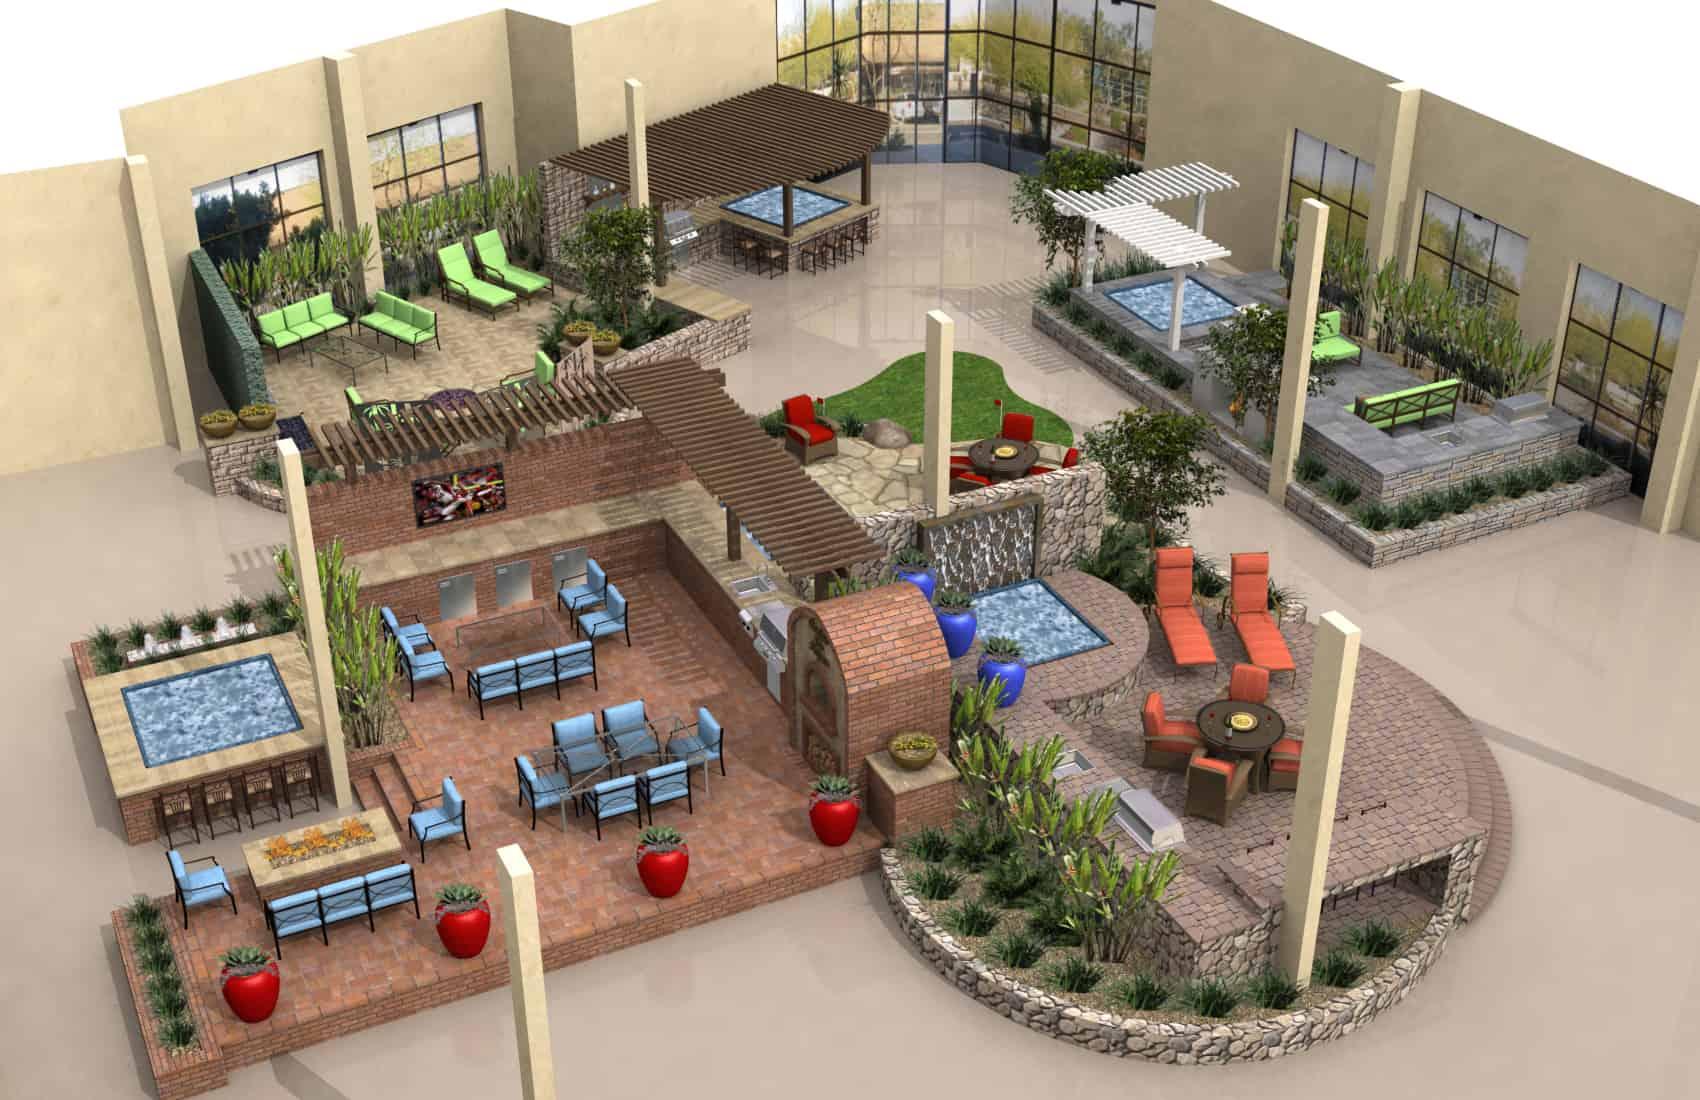 Showroom Construction for Imagine Backyard Living Is Underway! by Imagine Backyard Living